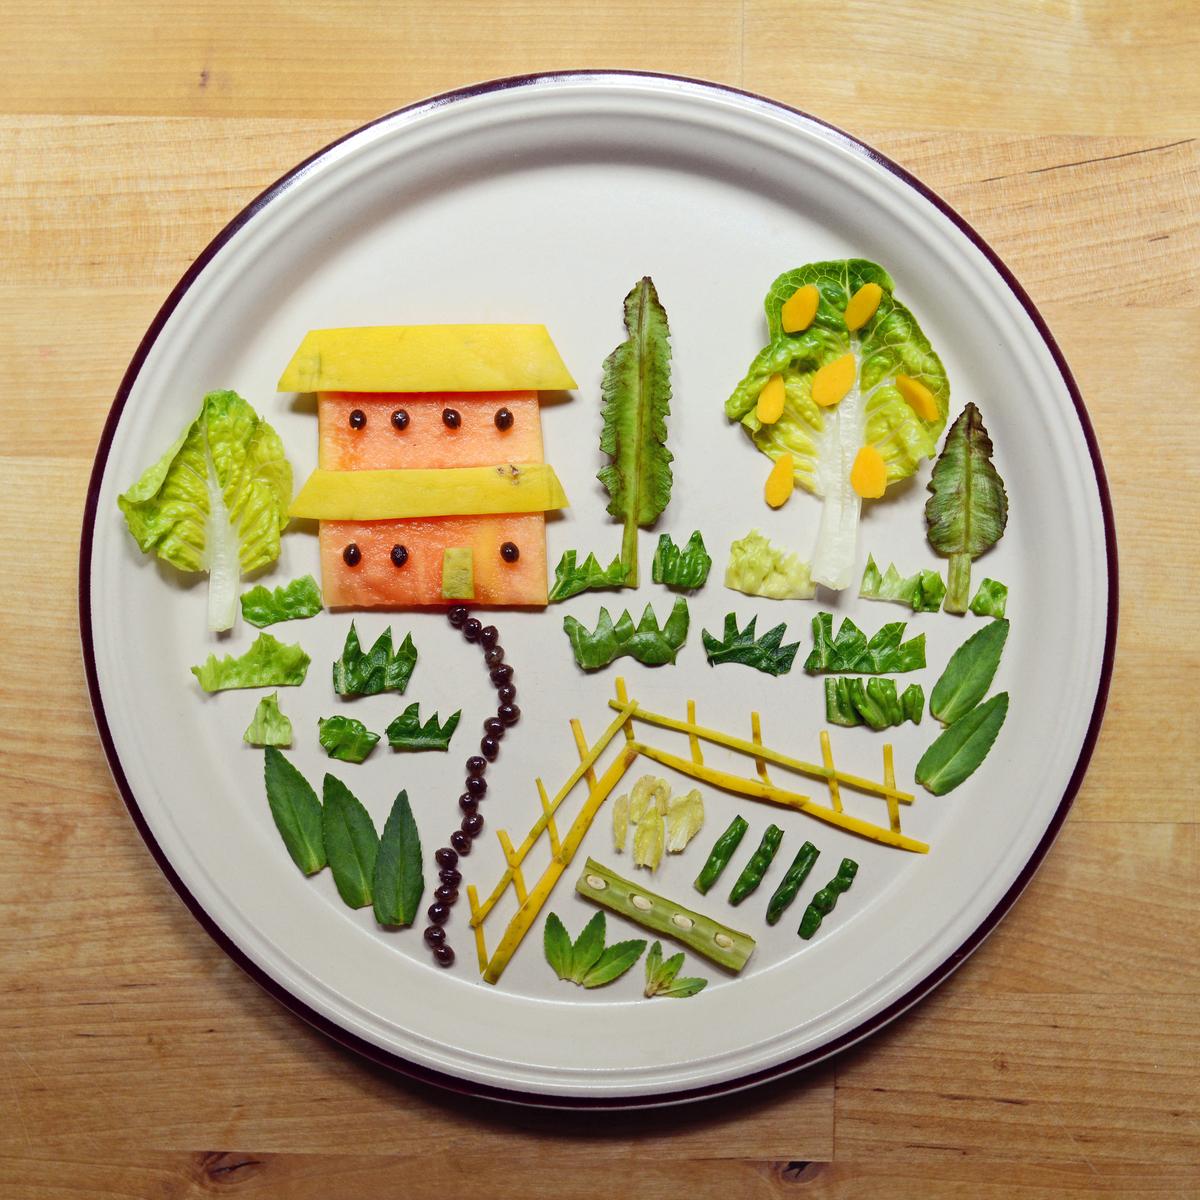 Food art work © IdaFrosk